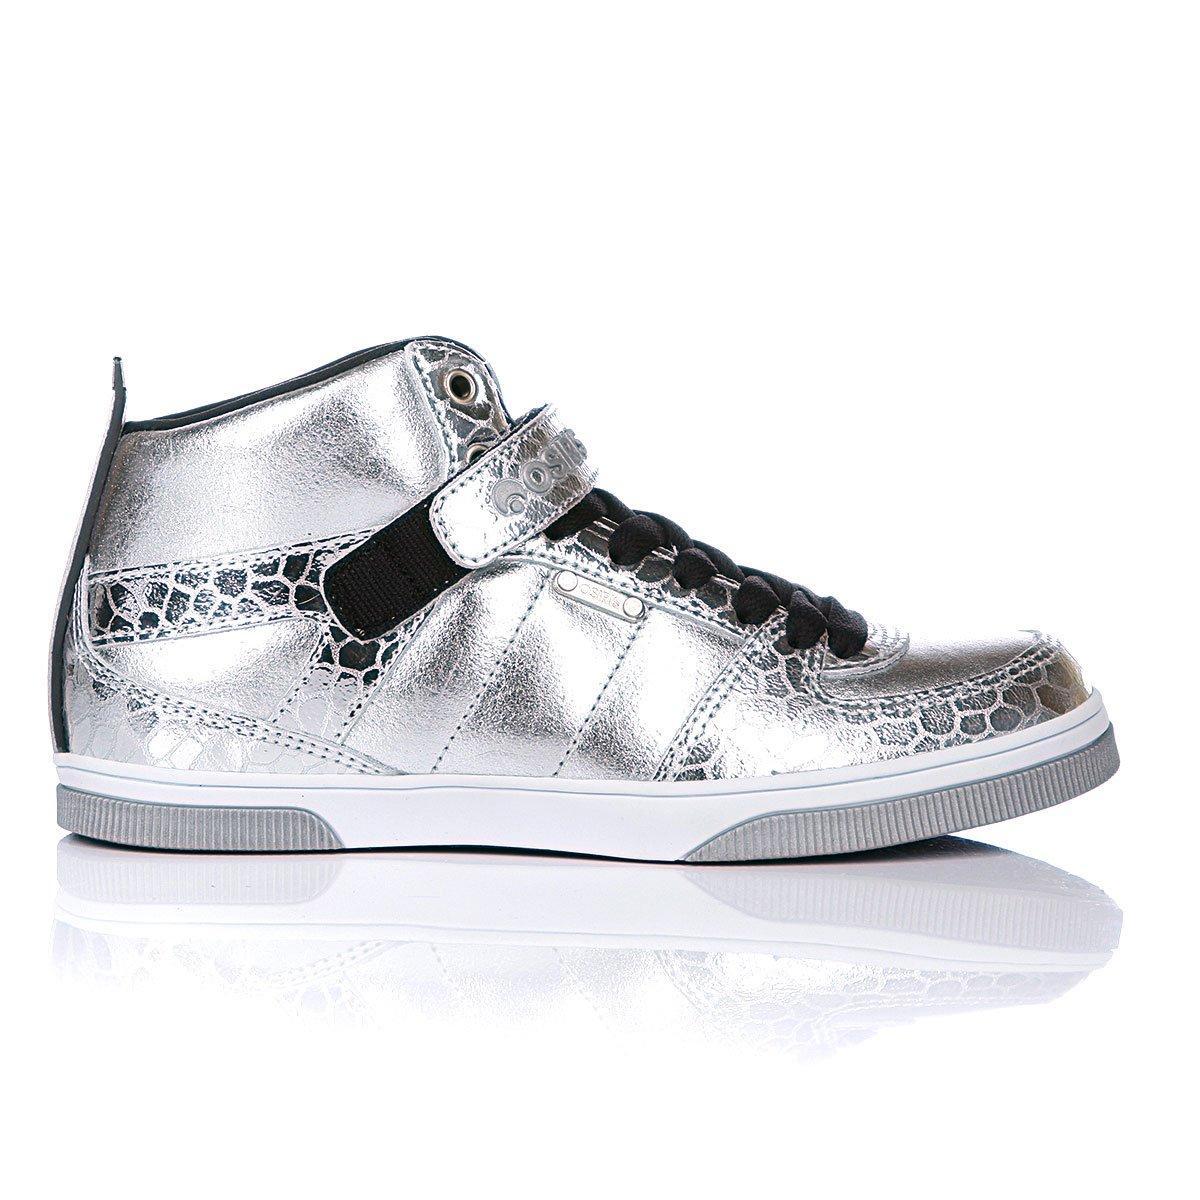 8d6a6c6c Кроссовки Osiris uptown metal/croc 5, цена 1 250 грн., купить Київ —  Prom.ua (ID#878038190)